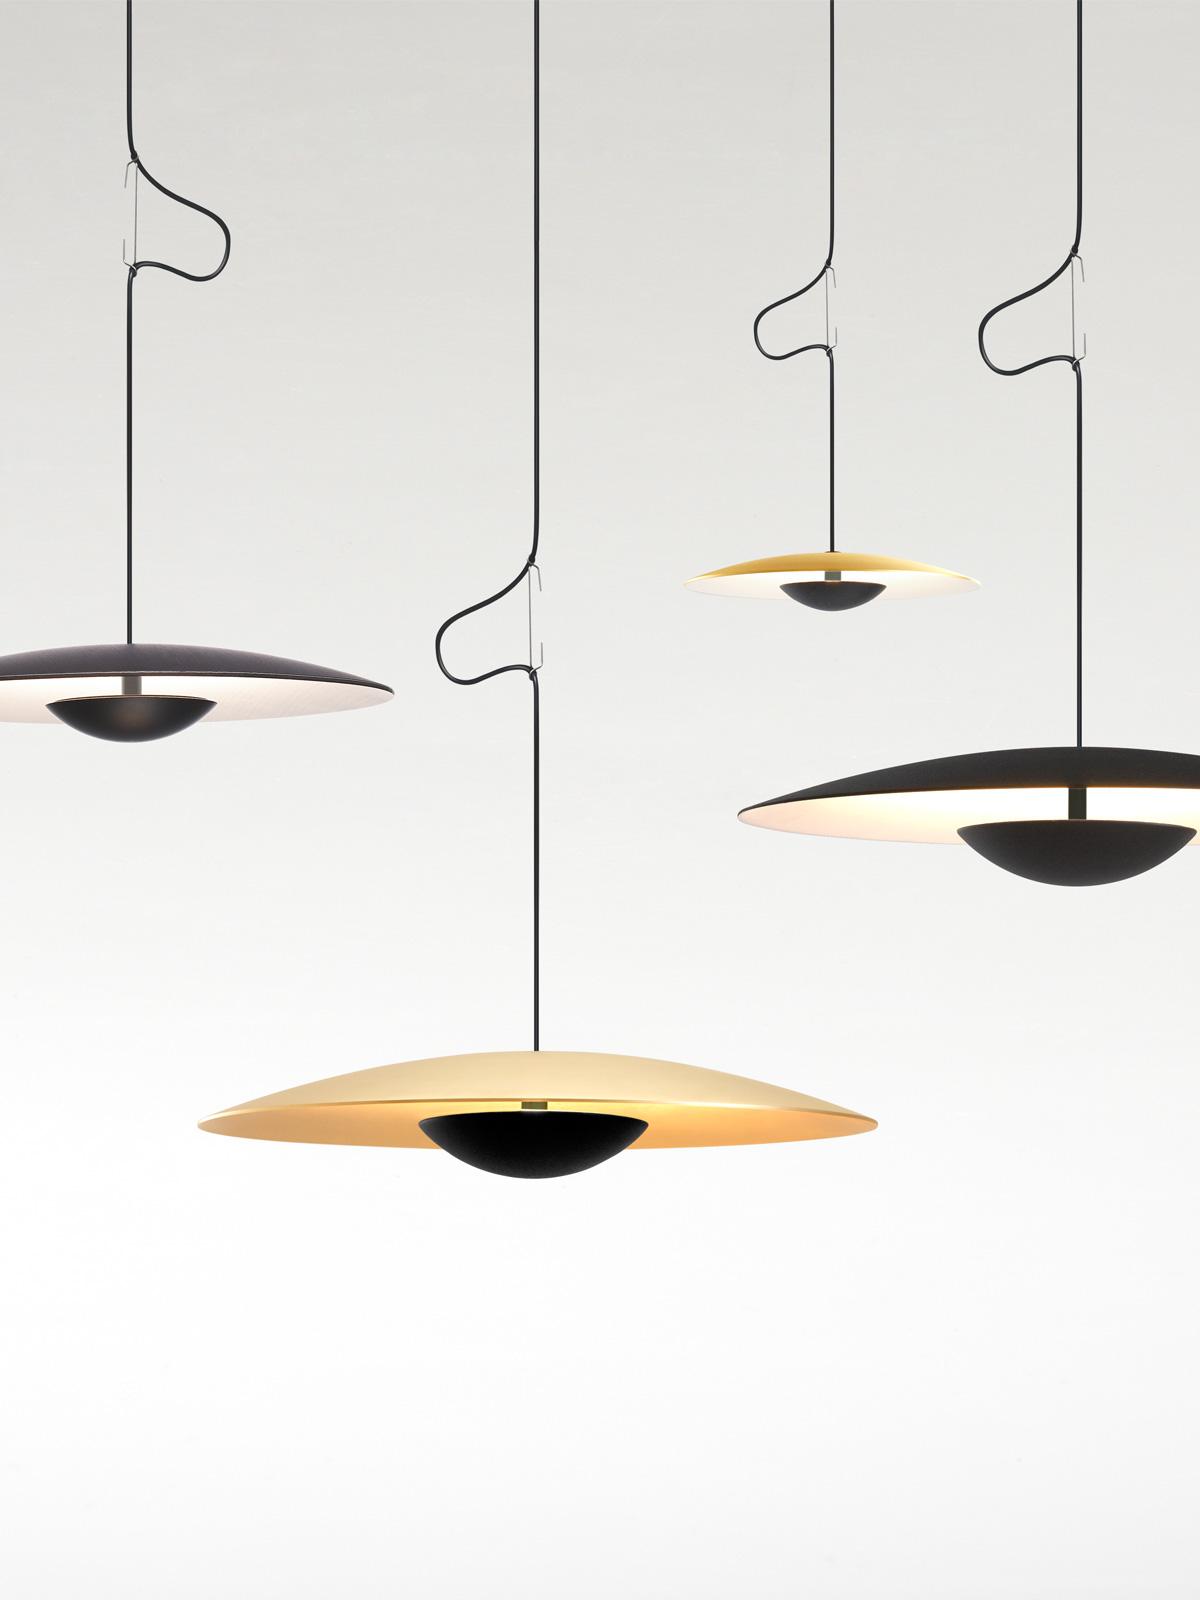 Marset Ginger Metall Lampe DesignOrt Onlineshop Leuchten Berlin